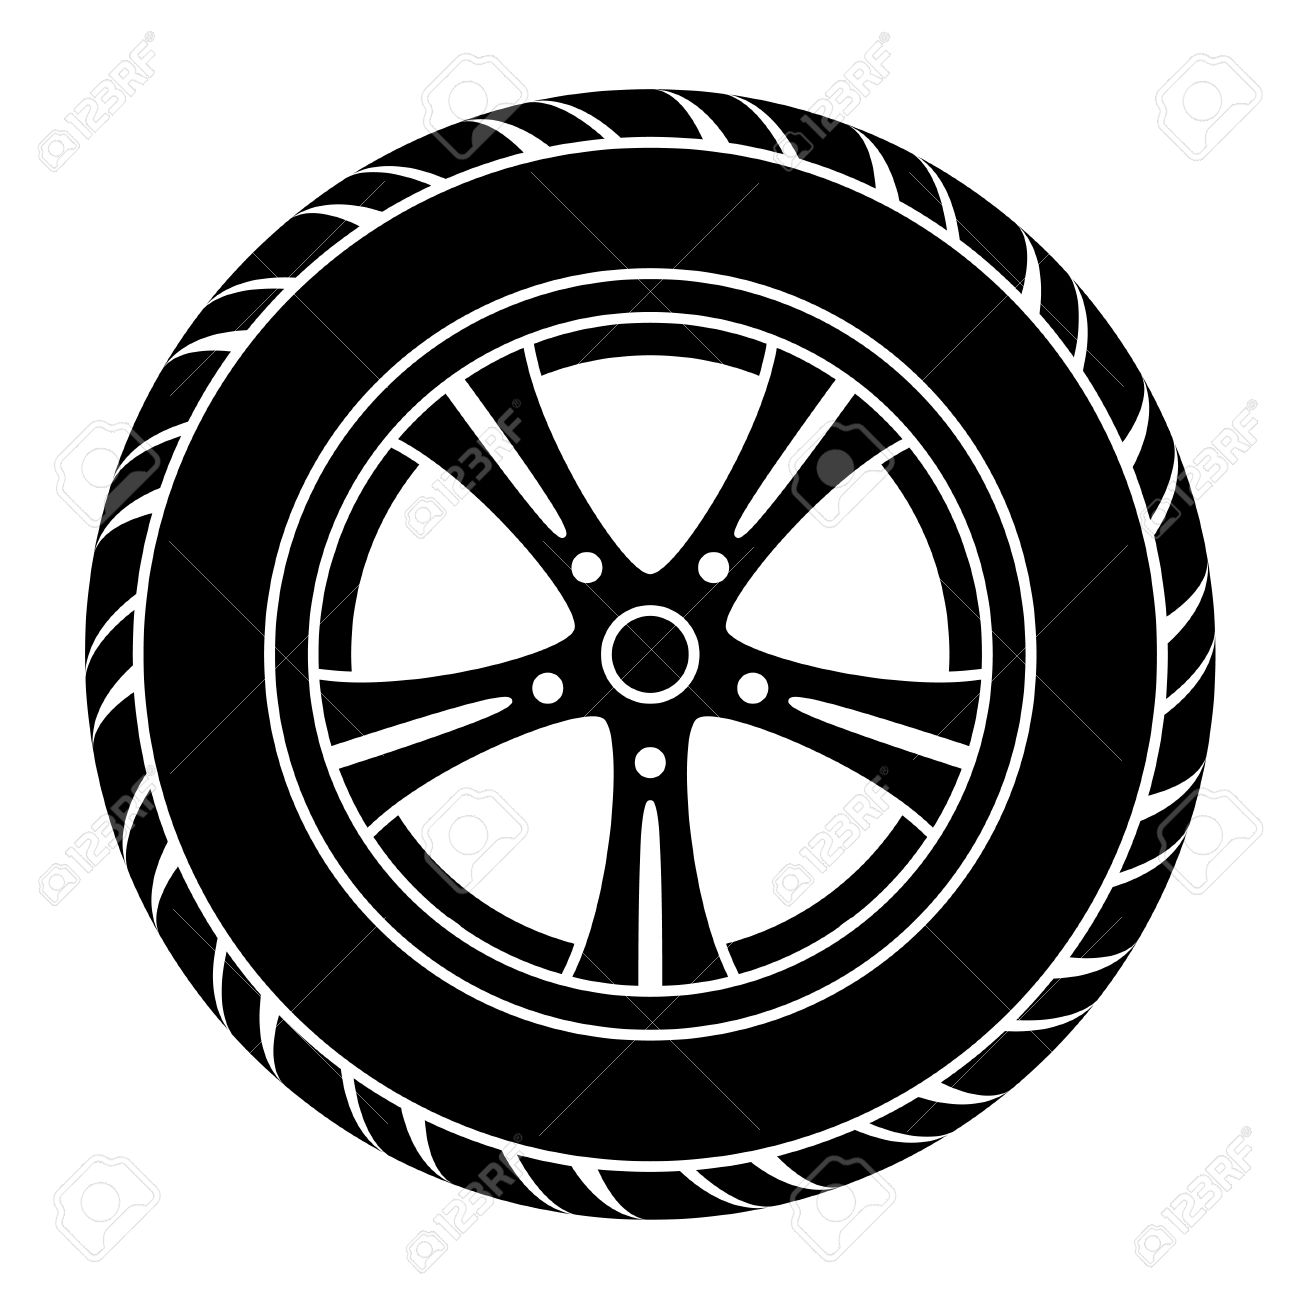 Nasa symbol black and white